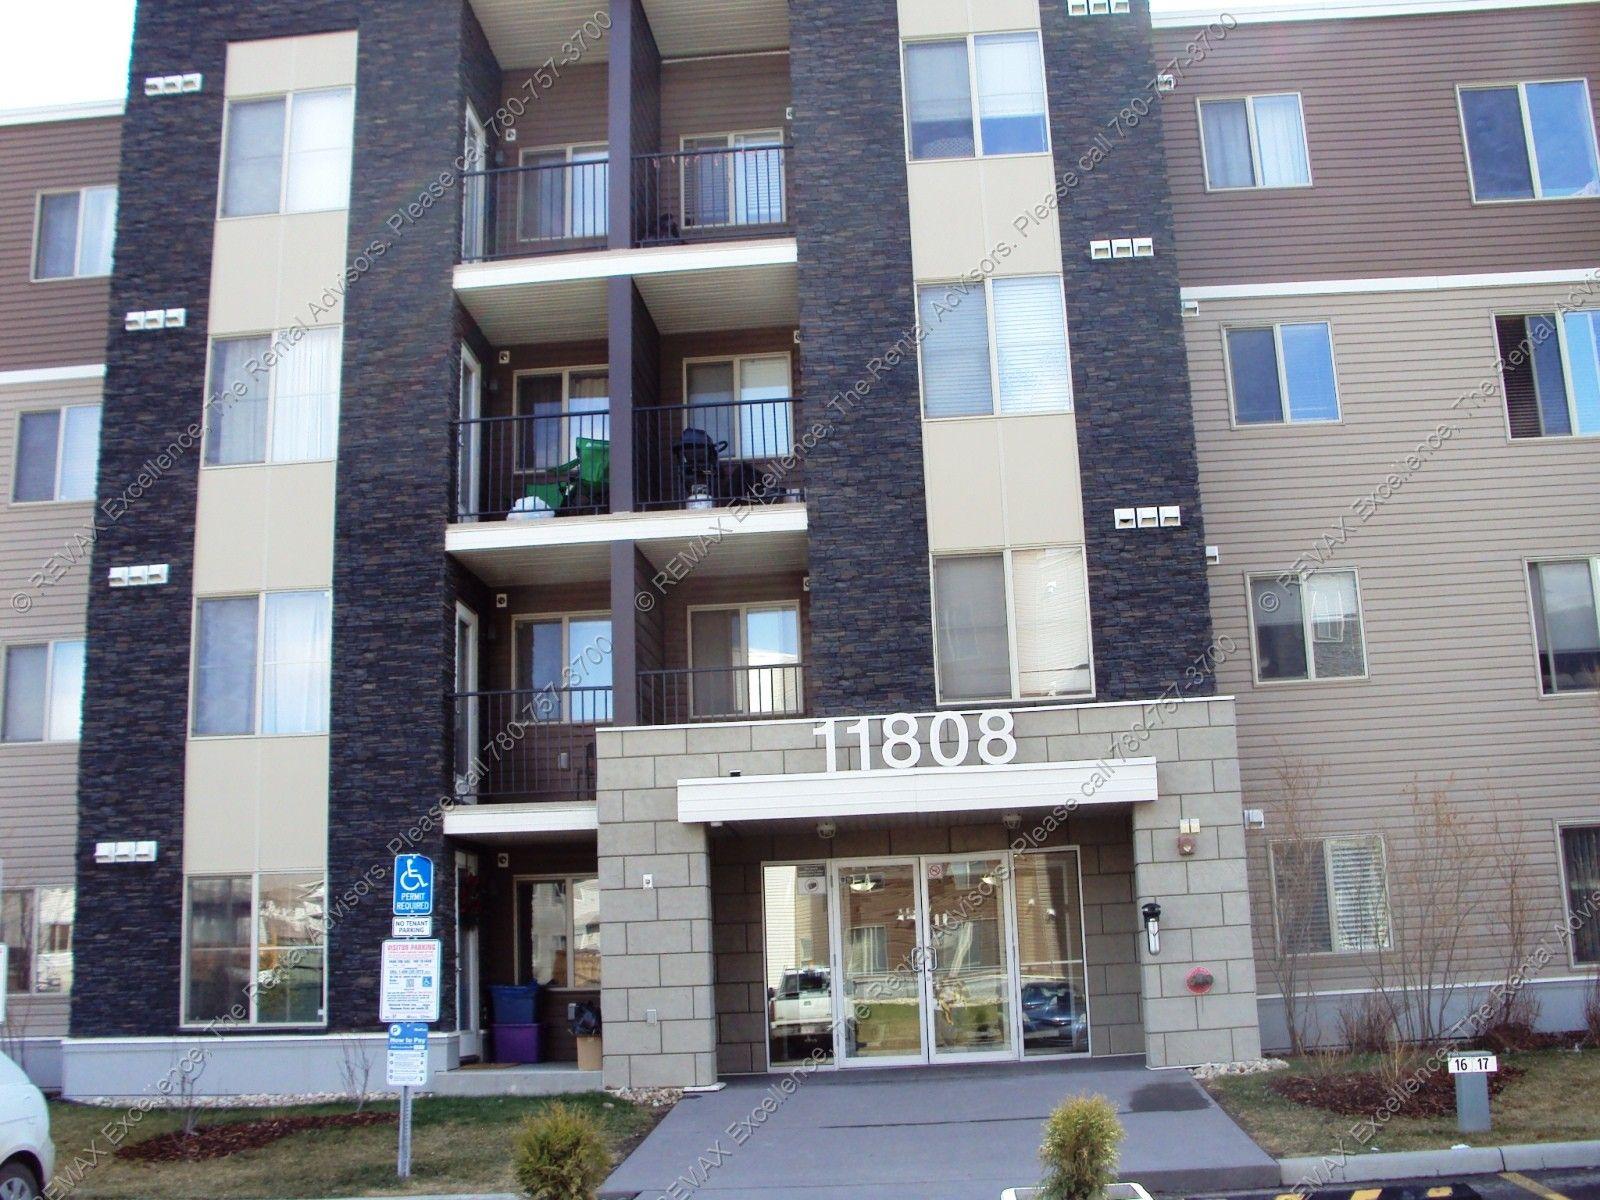 Calgary Edmonton Residential Property Management For Rent Condos For Rent Condos For Sale Rental Property